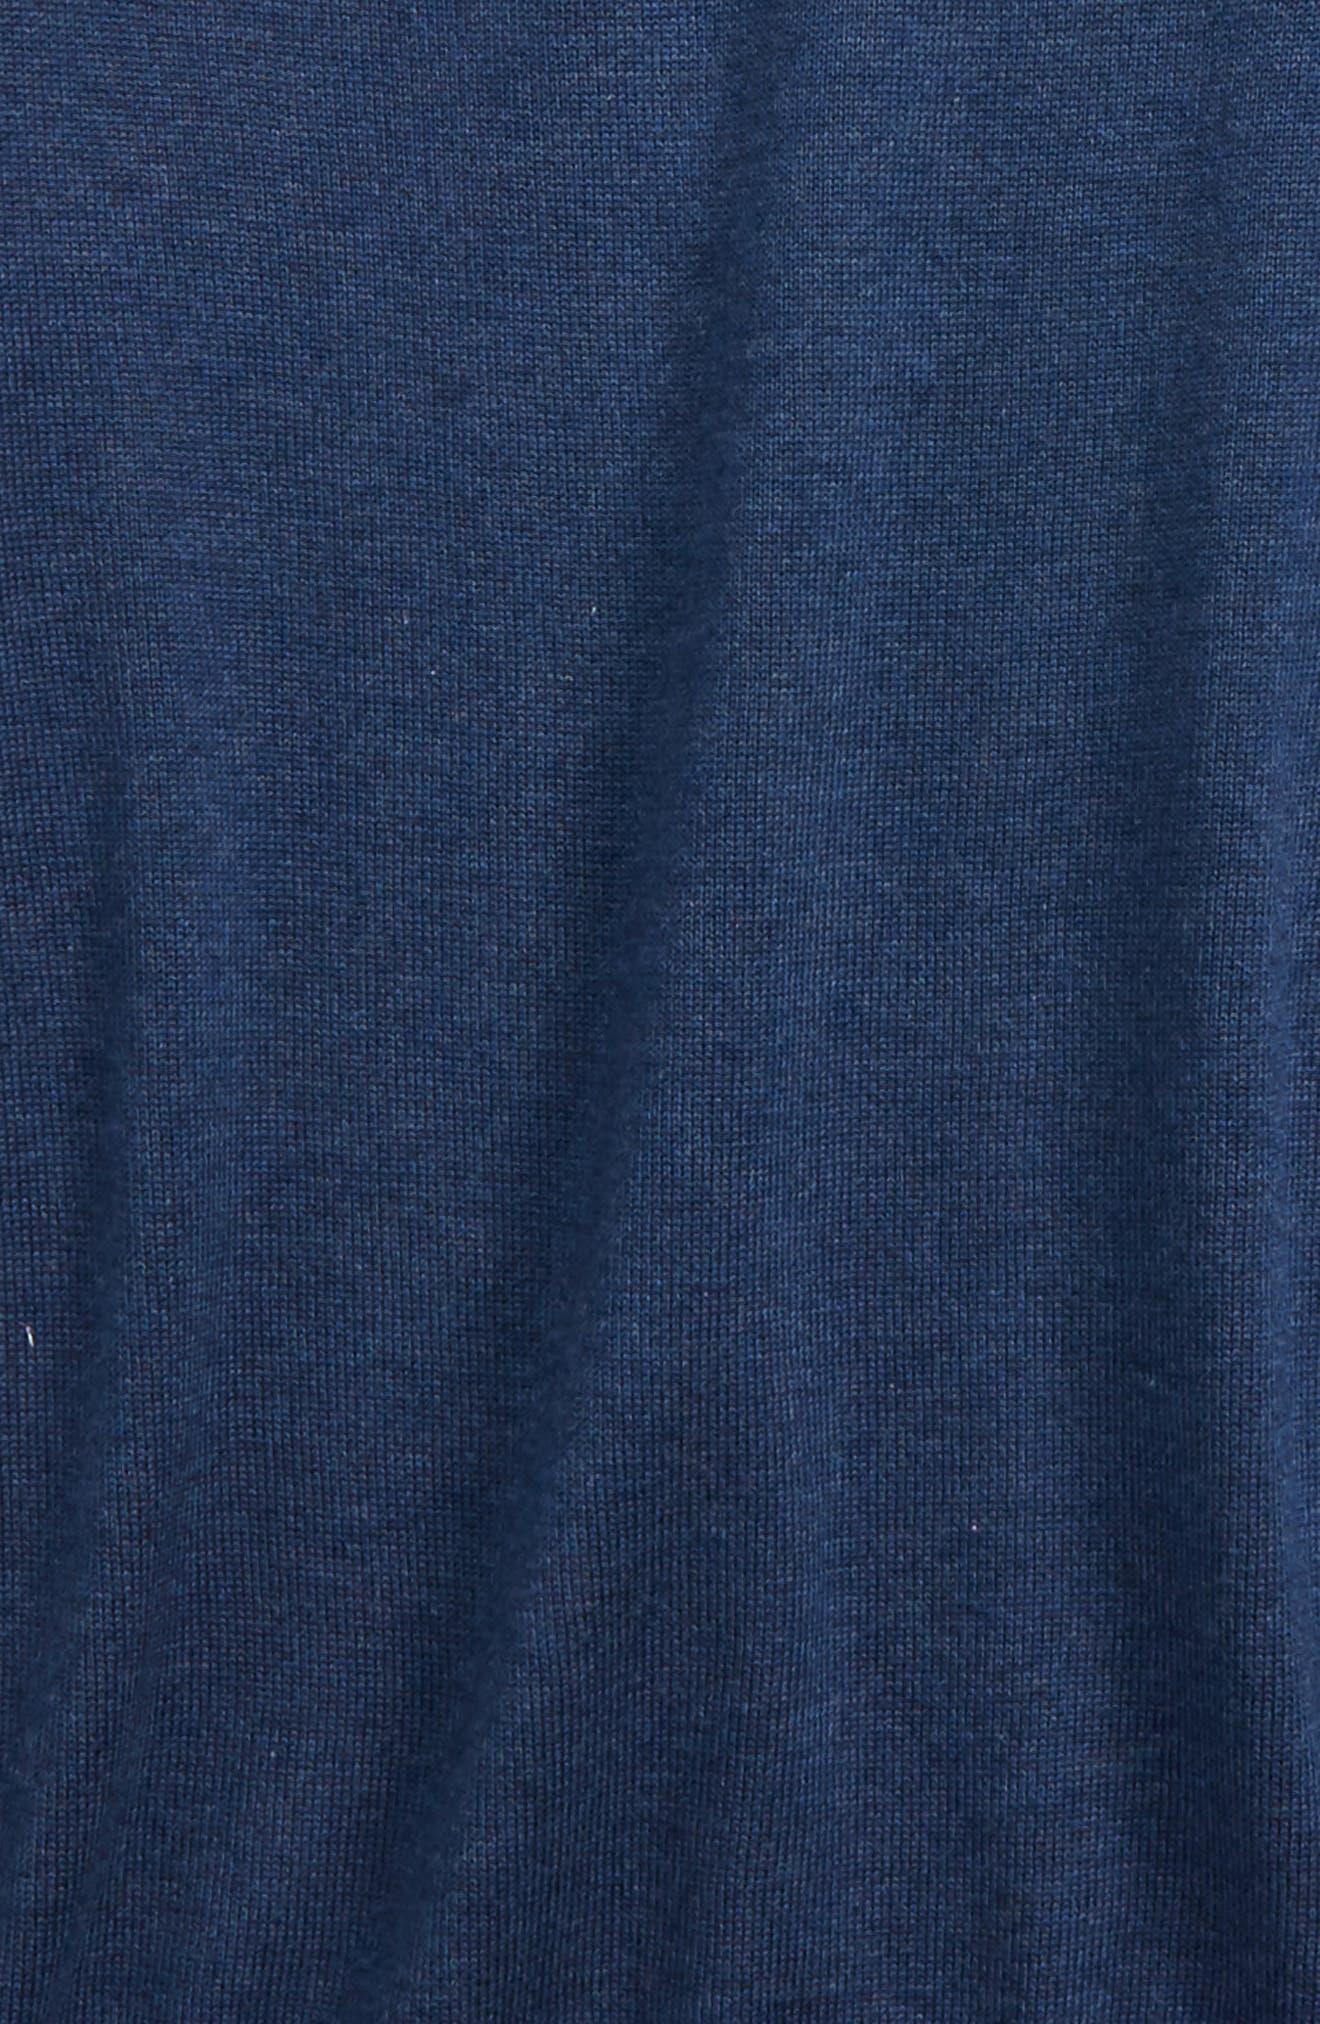 Classic Quarter Zip Sweater,                             Alternate thumbnail 2, color,                             Deep Bay